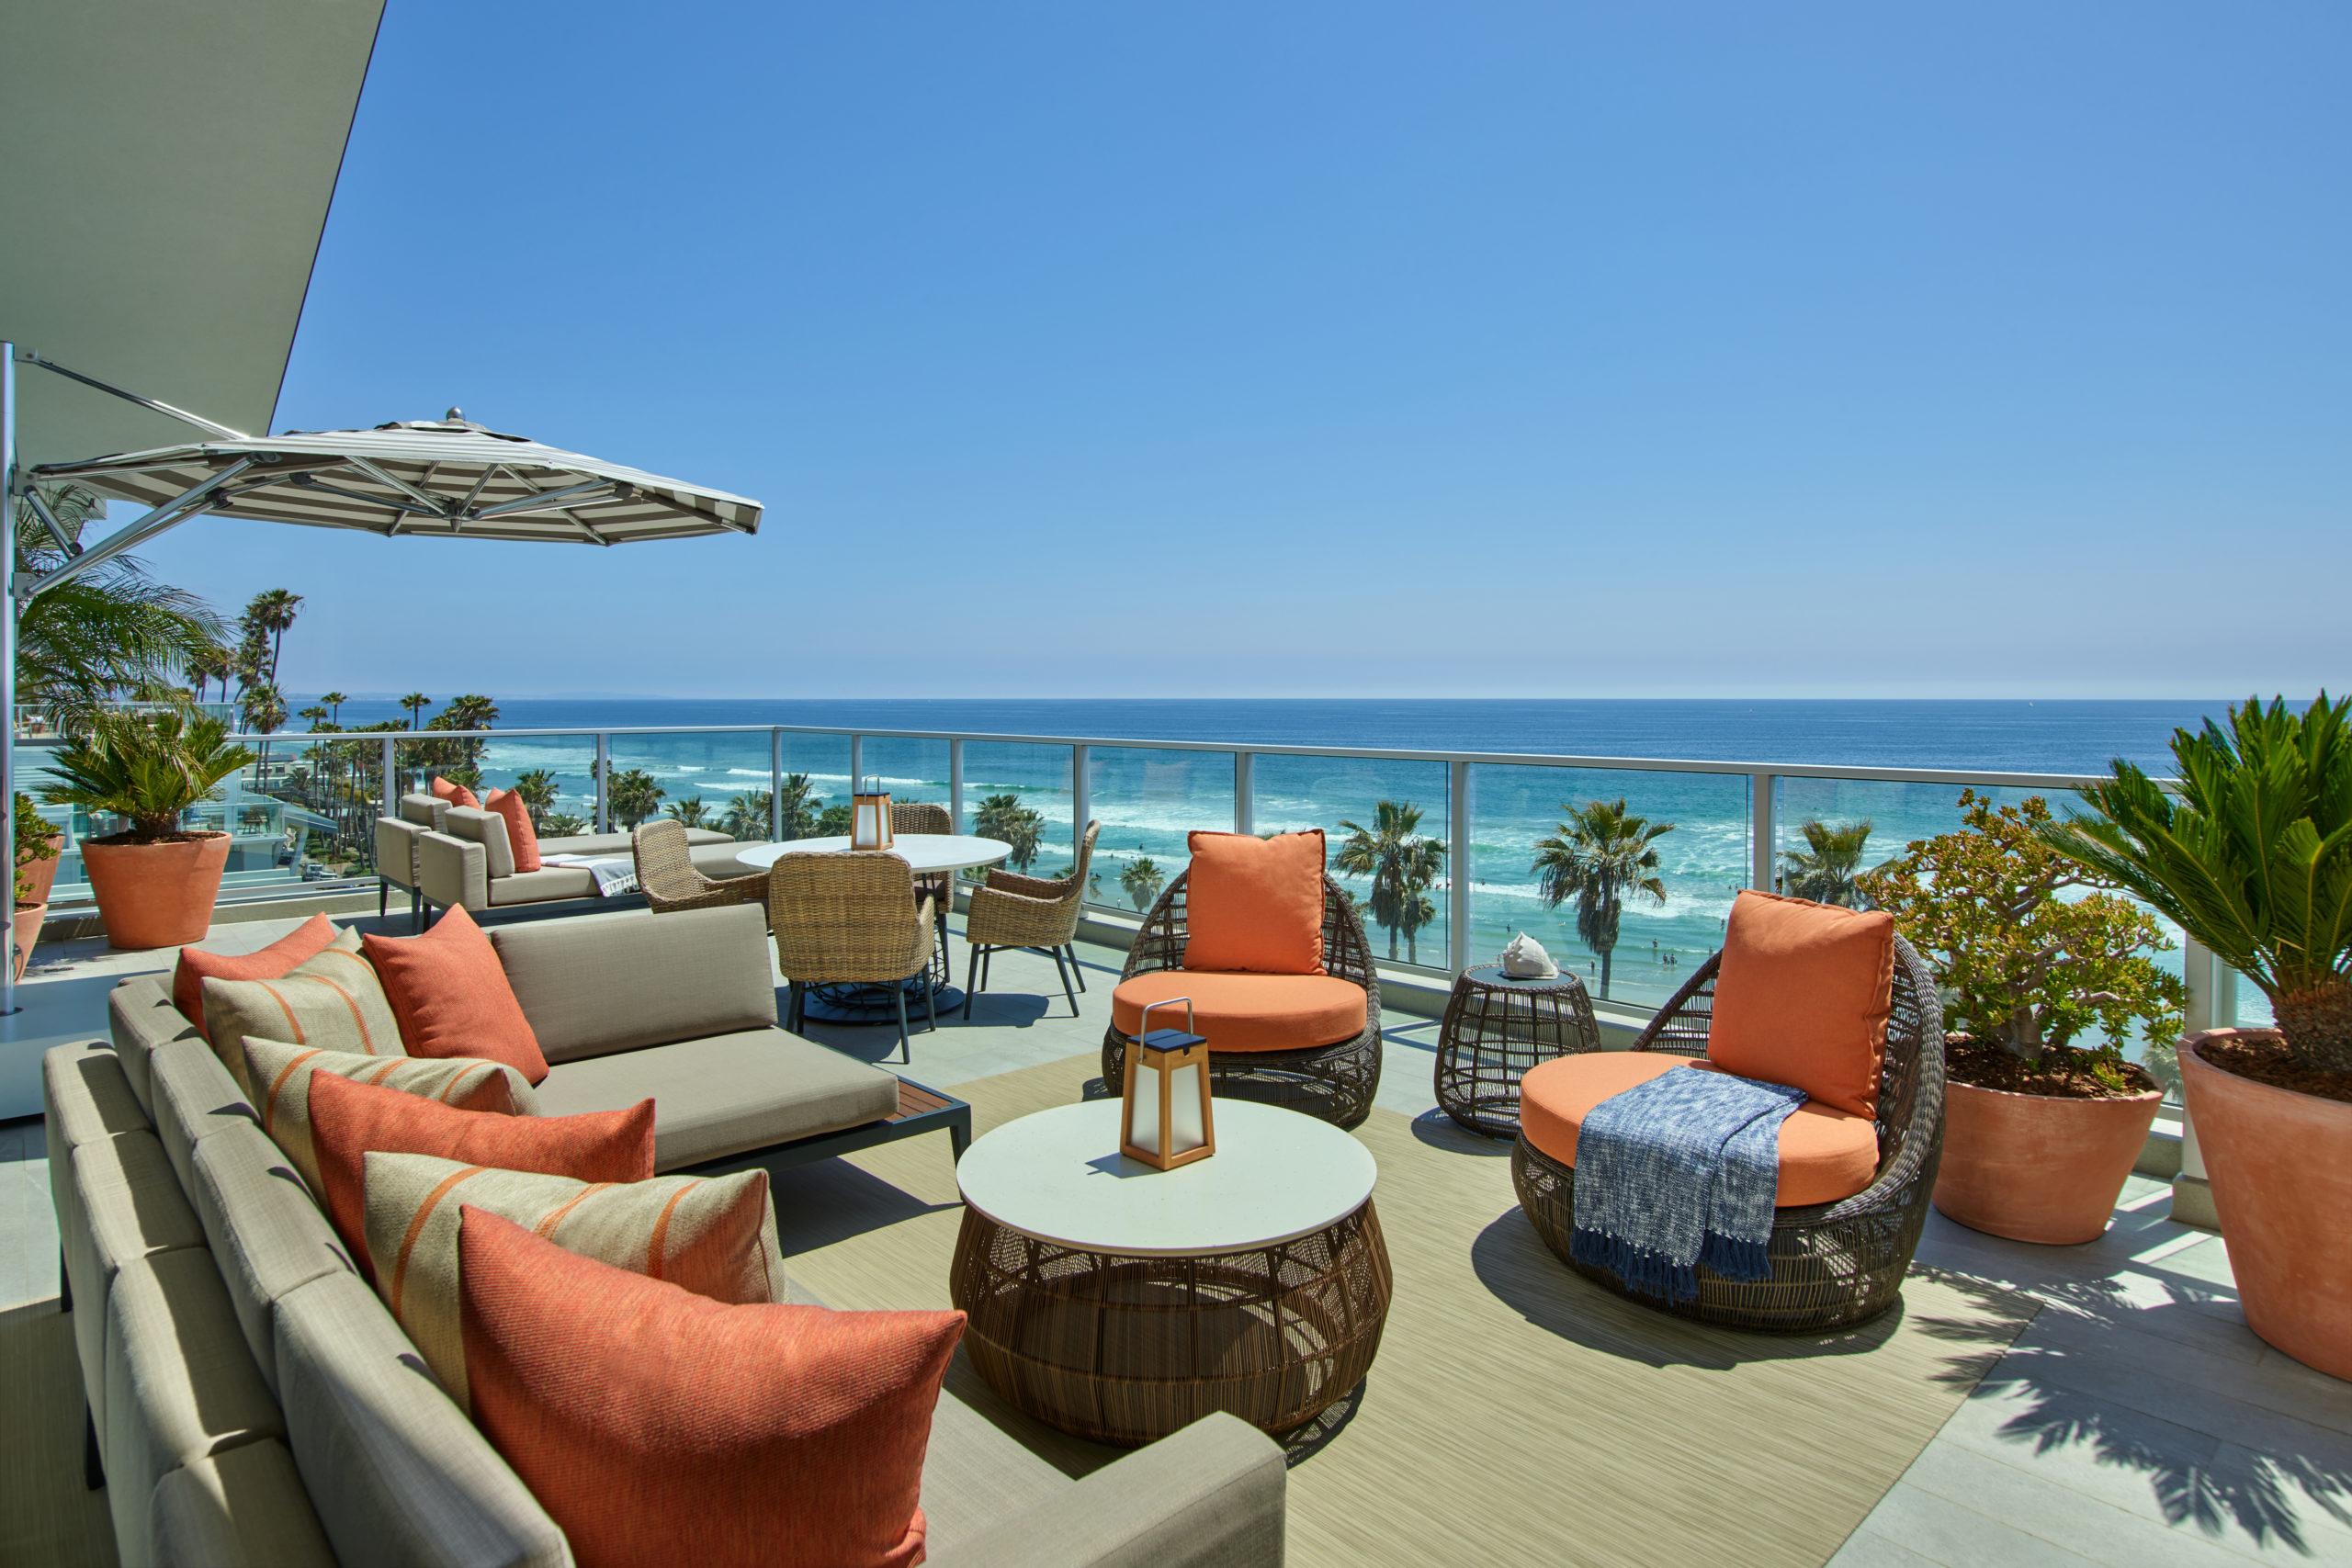 Patio Estate Suite sofas overlooking the sea